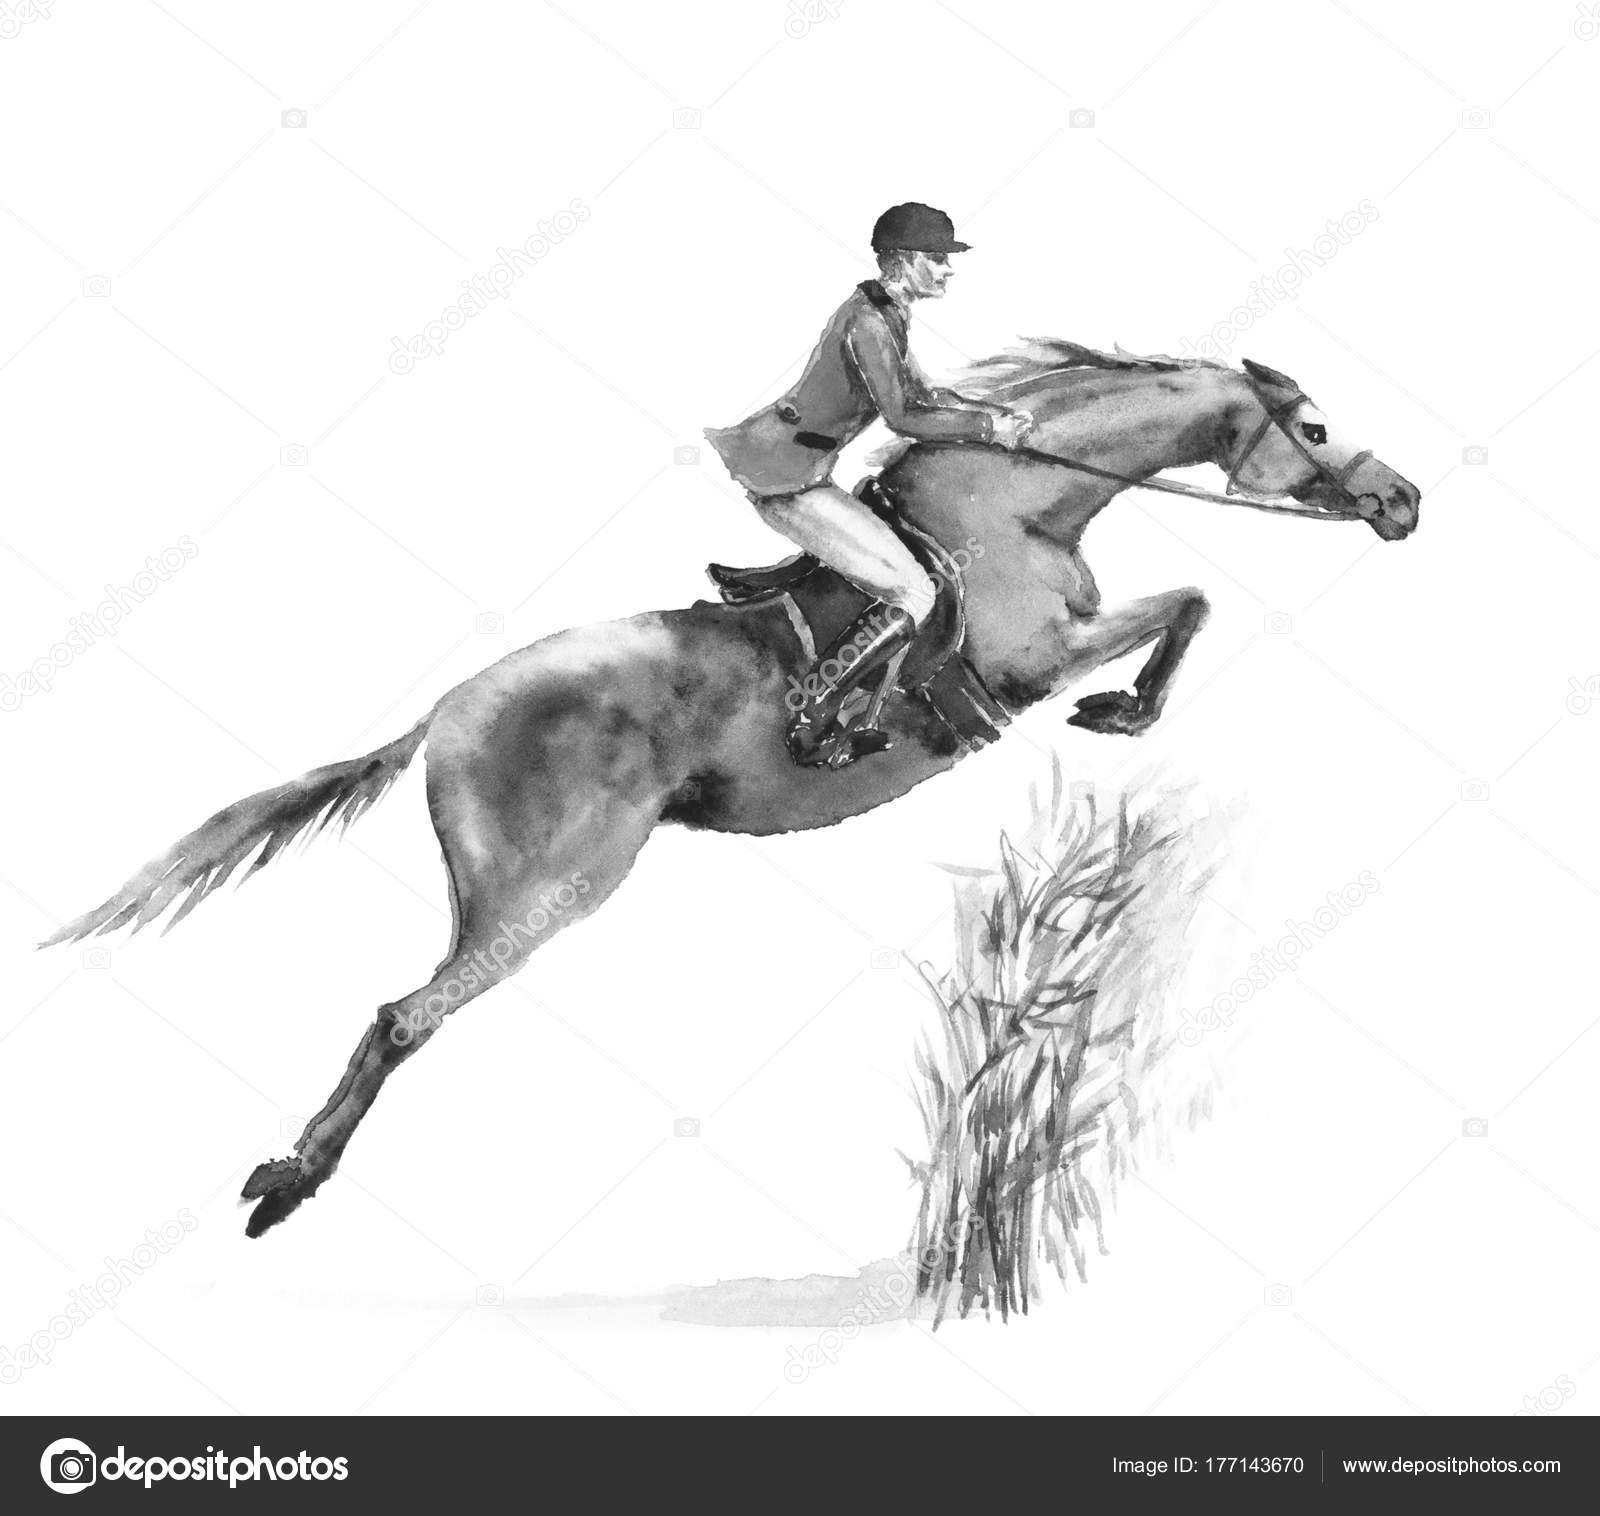 Horseback Rider Man Horse Jumping Forest White Black White Monochrome Stock Photo C Larisa Zorina 177143670